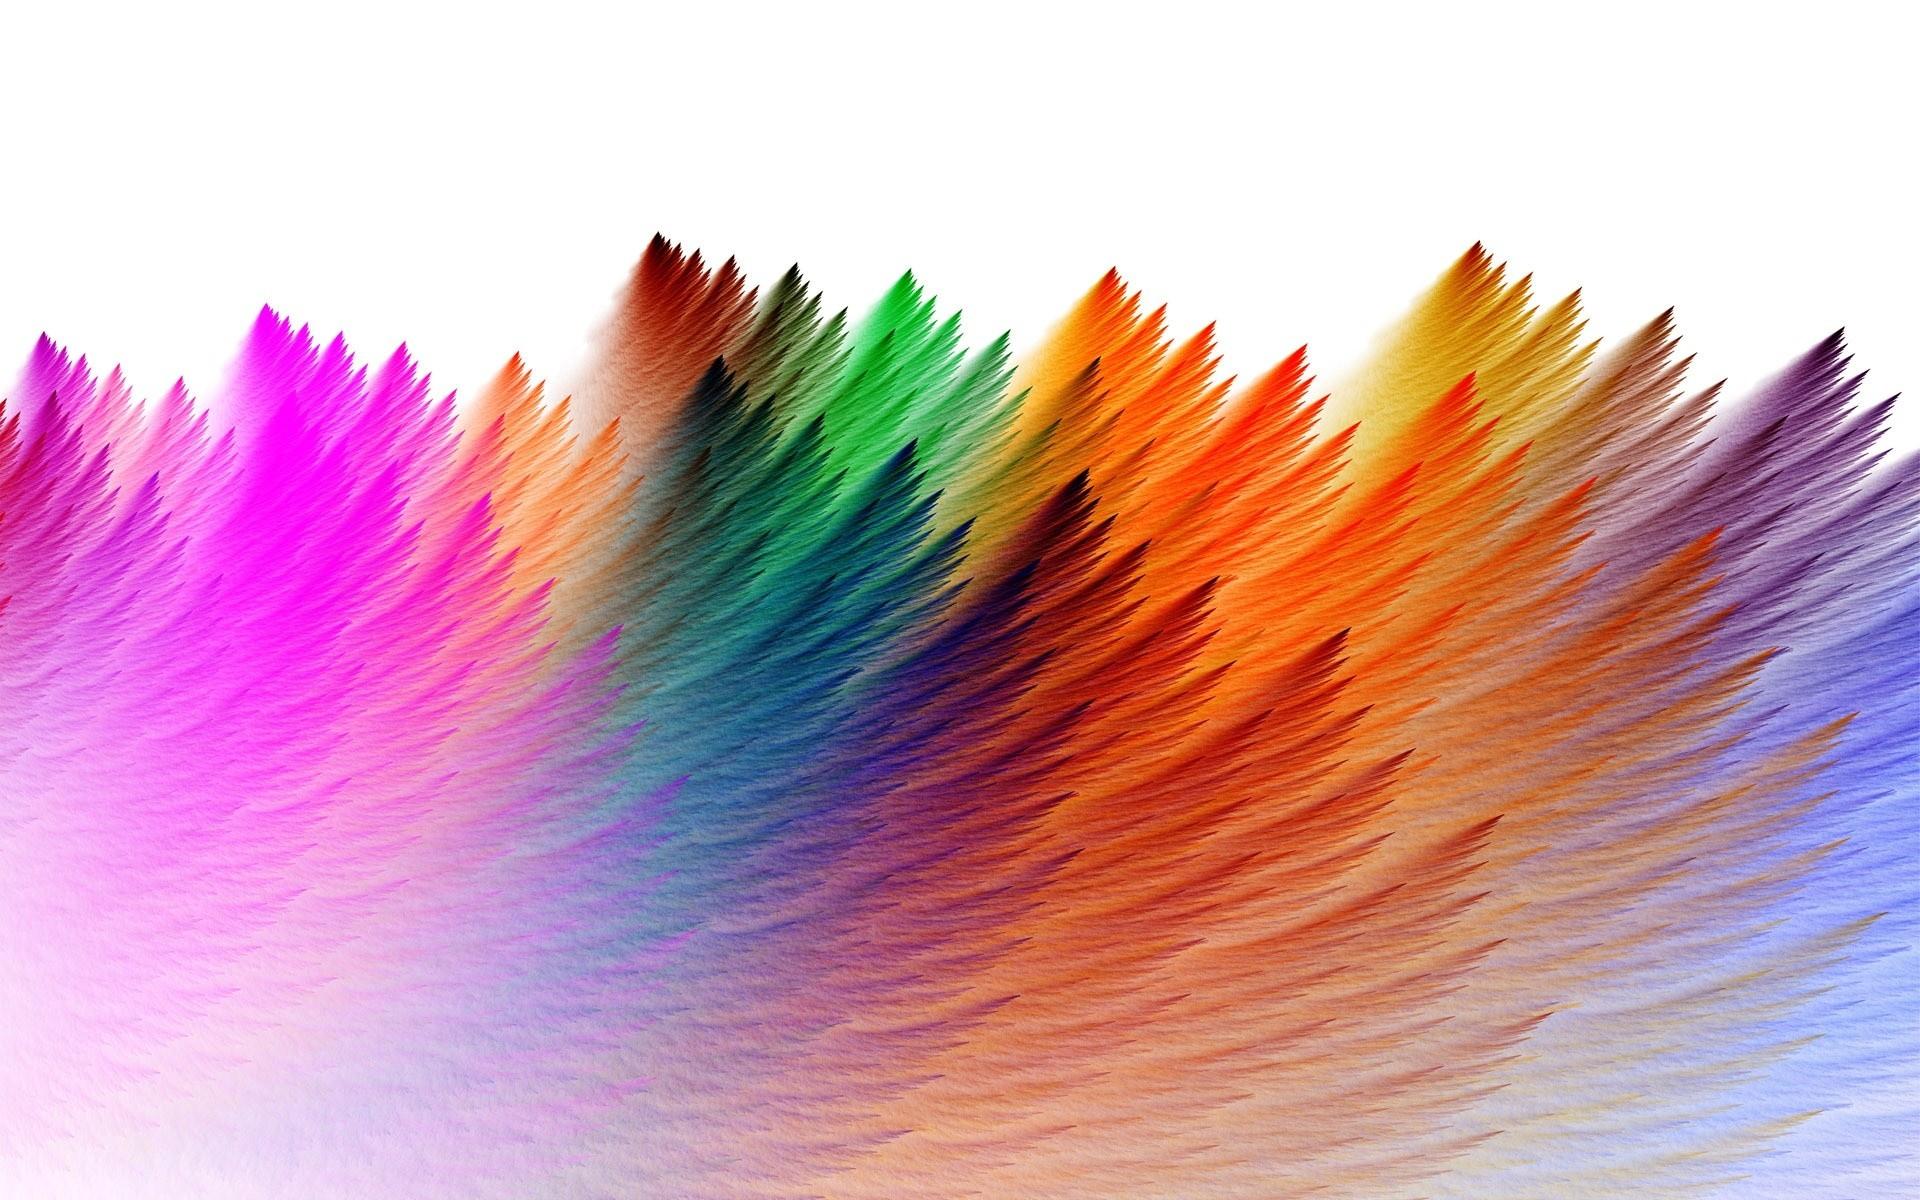 1920x1200 Bright Solid Color Wallpaper Free Art 3 Index